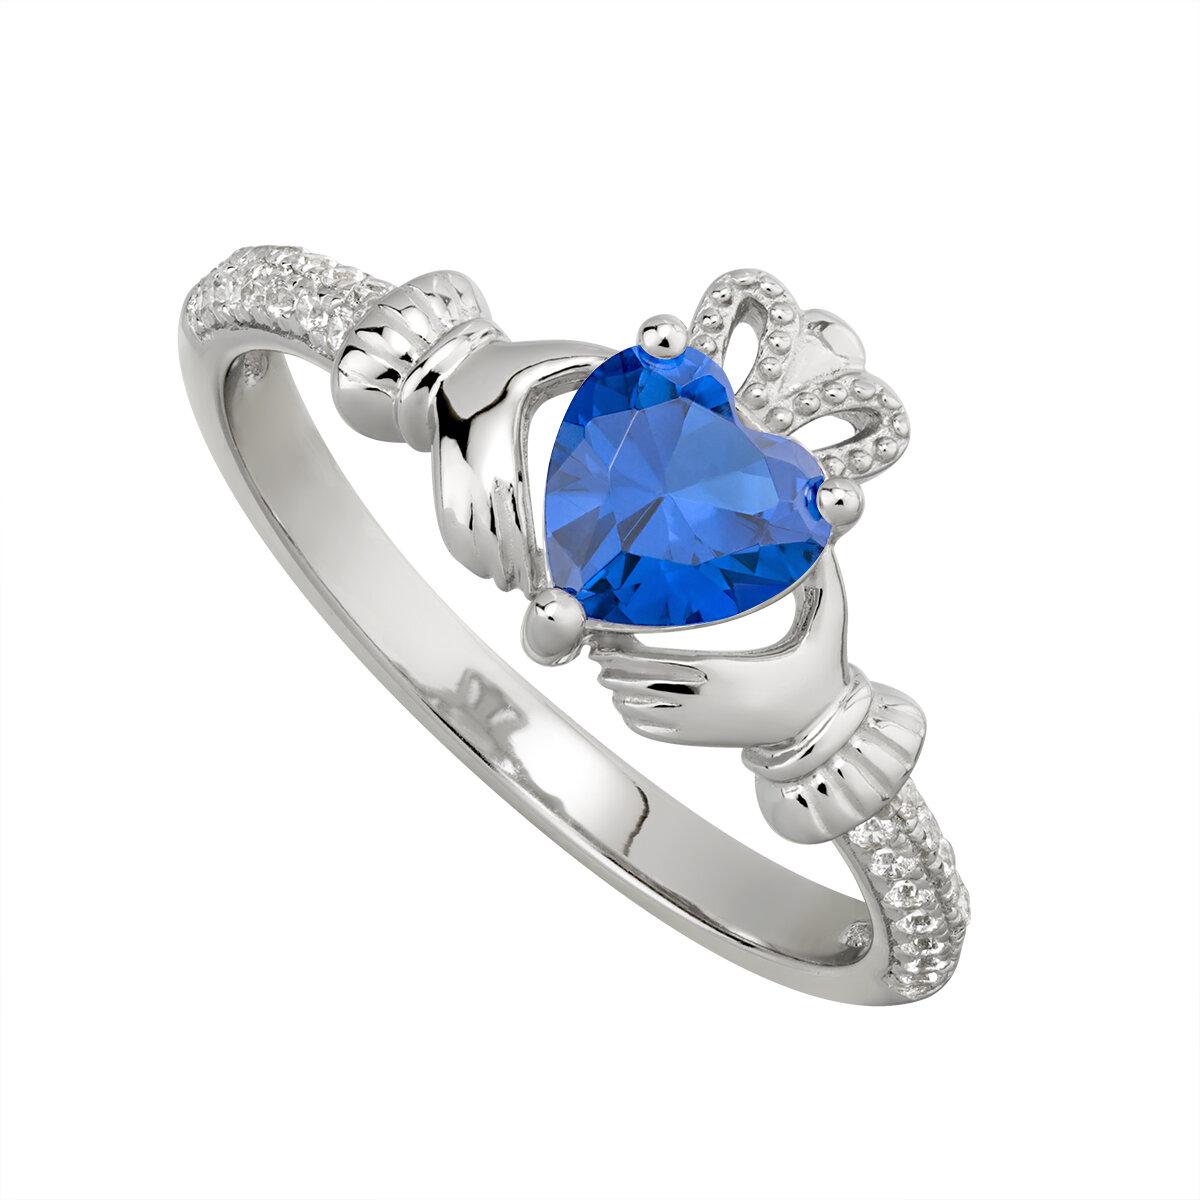 sterling silver claddagh ring september birthstone s2106209 from Solvar